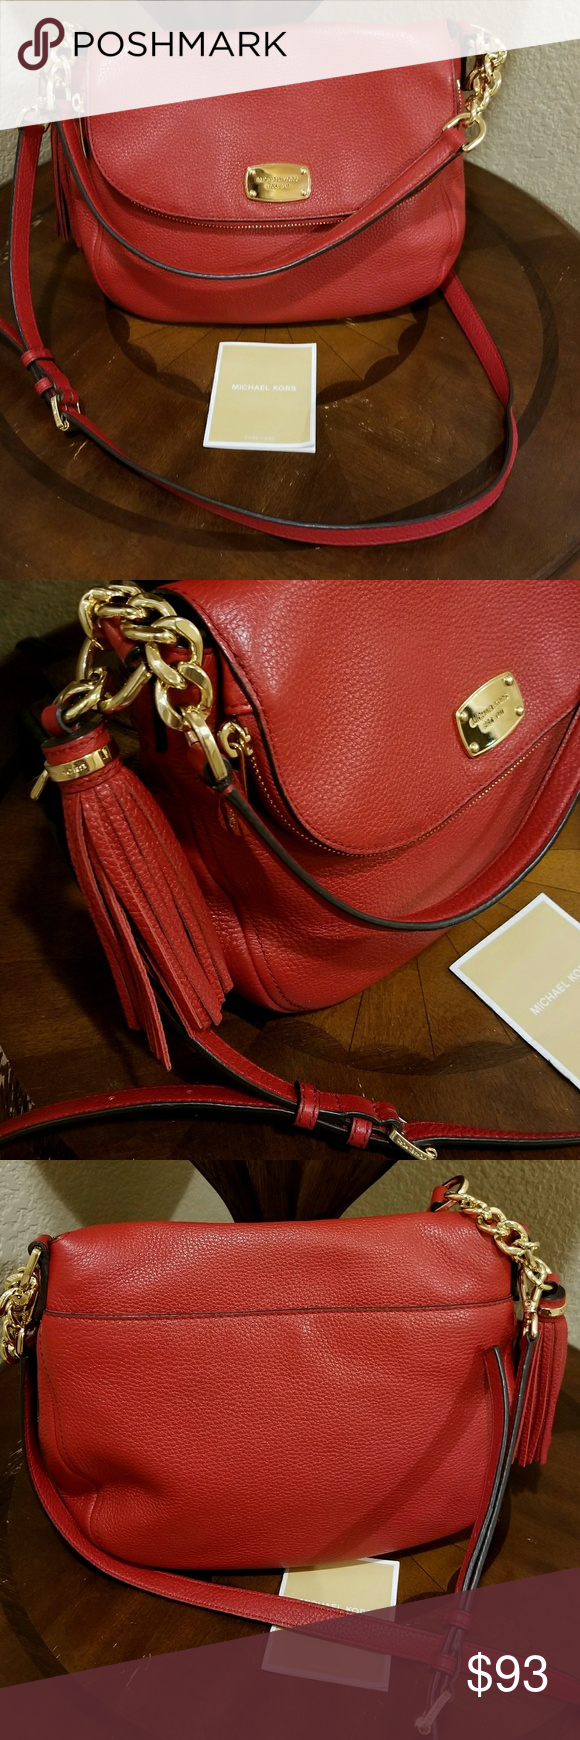 3201a609411954 Michael Kors Bedford tassel crossbody shoulder bag Authentic, very gently  used Michael Kors leather handbag